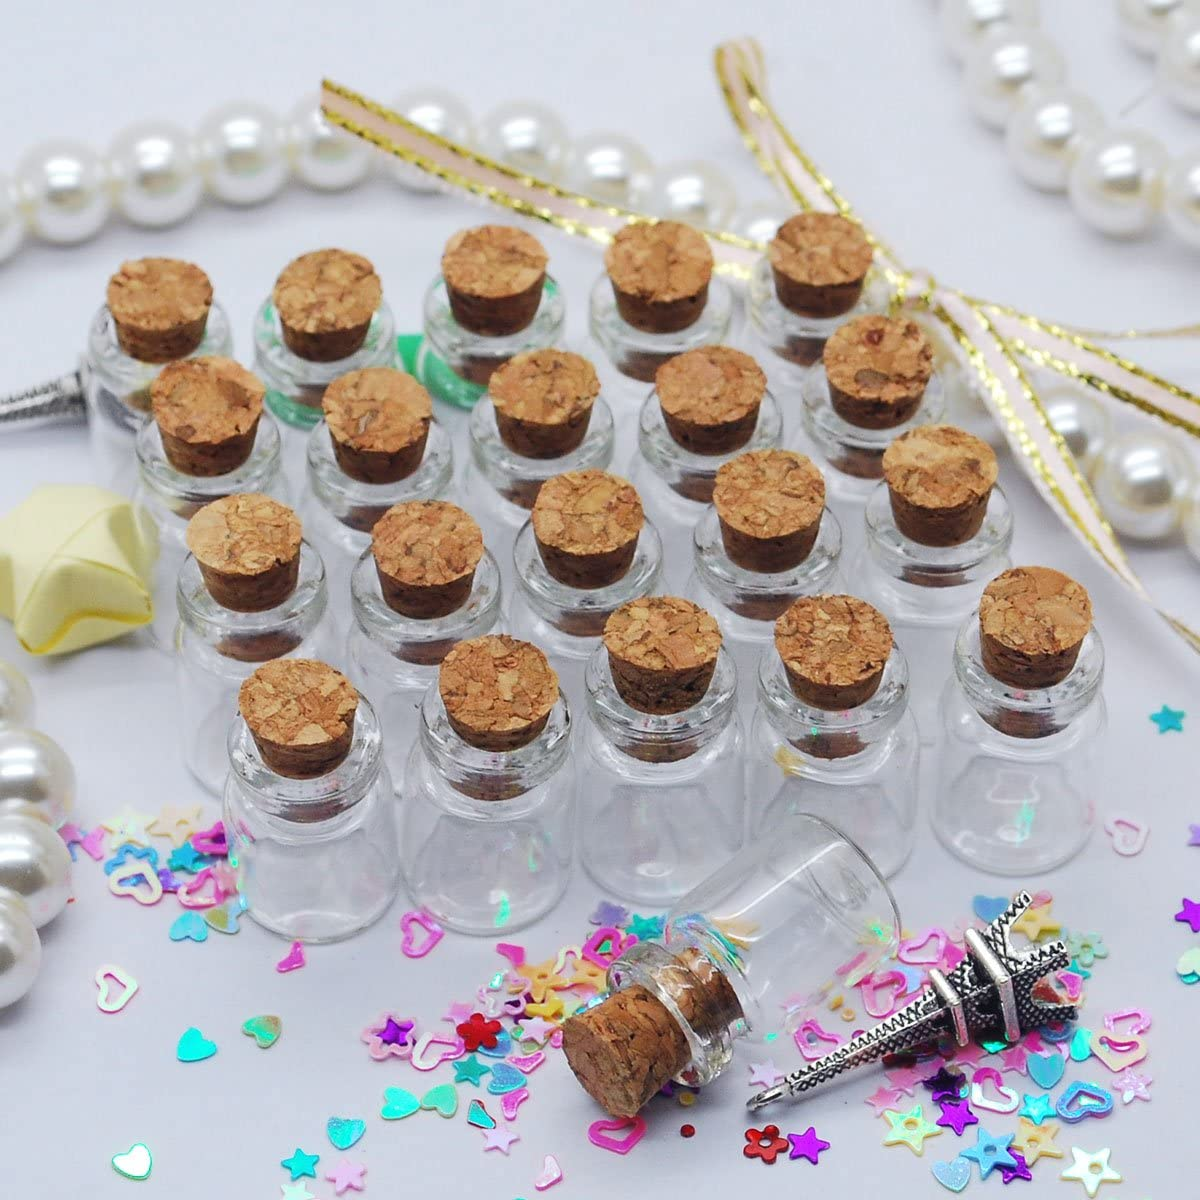 HooAMI 5pcs Mini Glass Bottle Tear Drops Jars Vials Wish Bottle Message Weddings Jewelry Party Favors